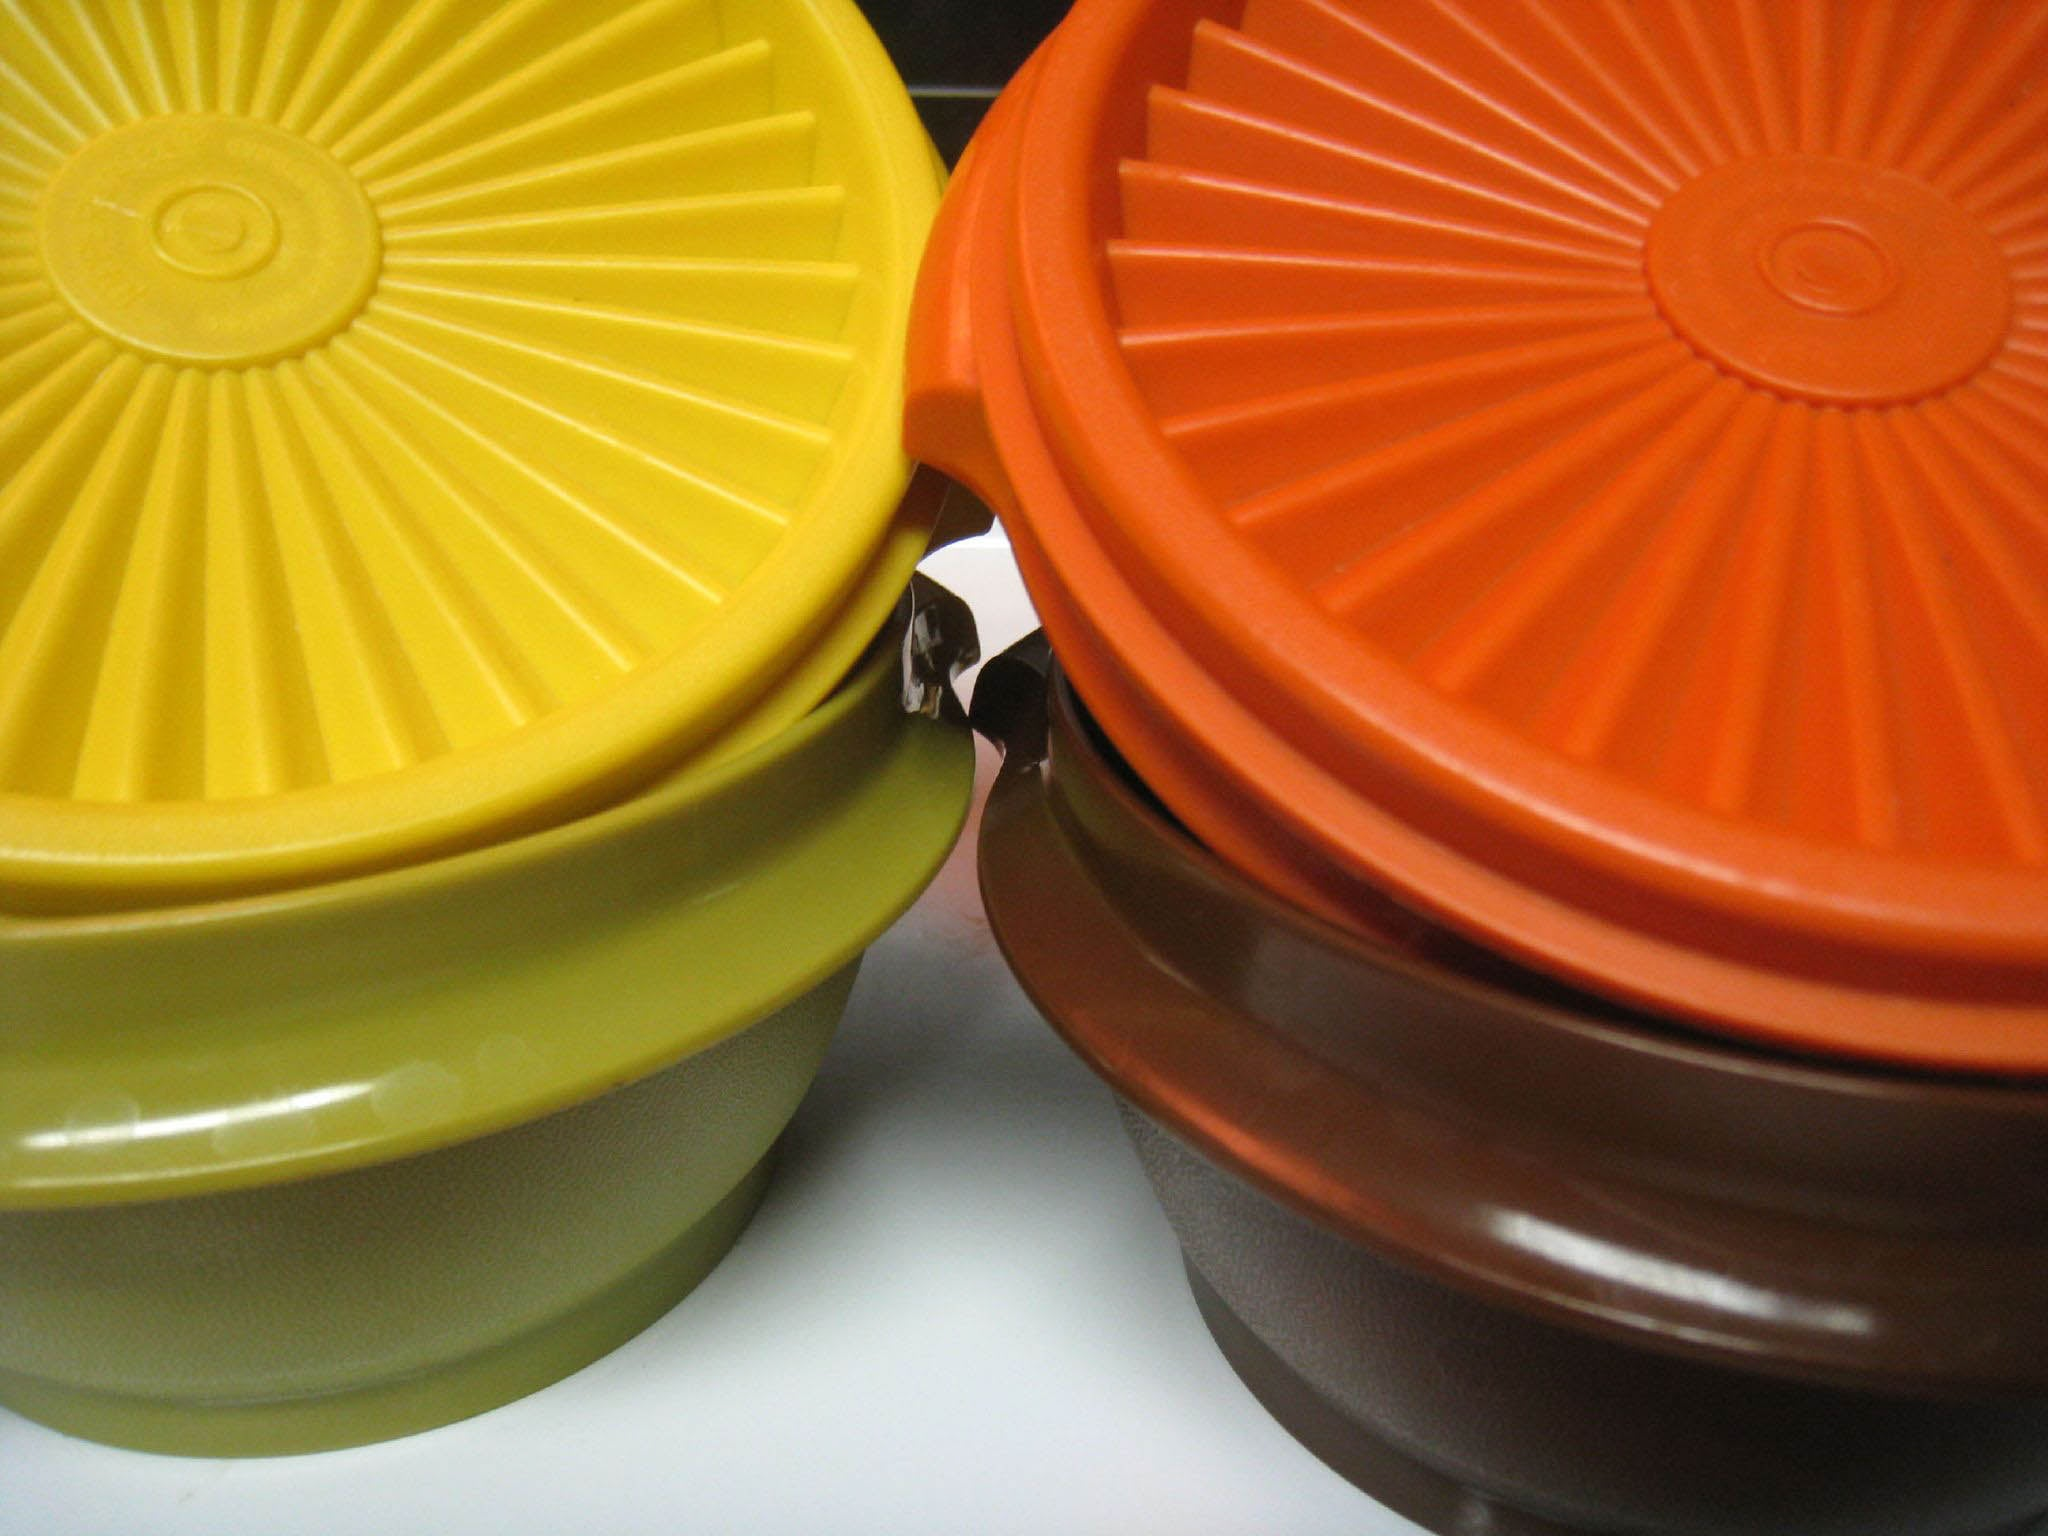 vintage tupperware dating shanghai kuka